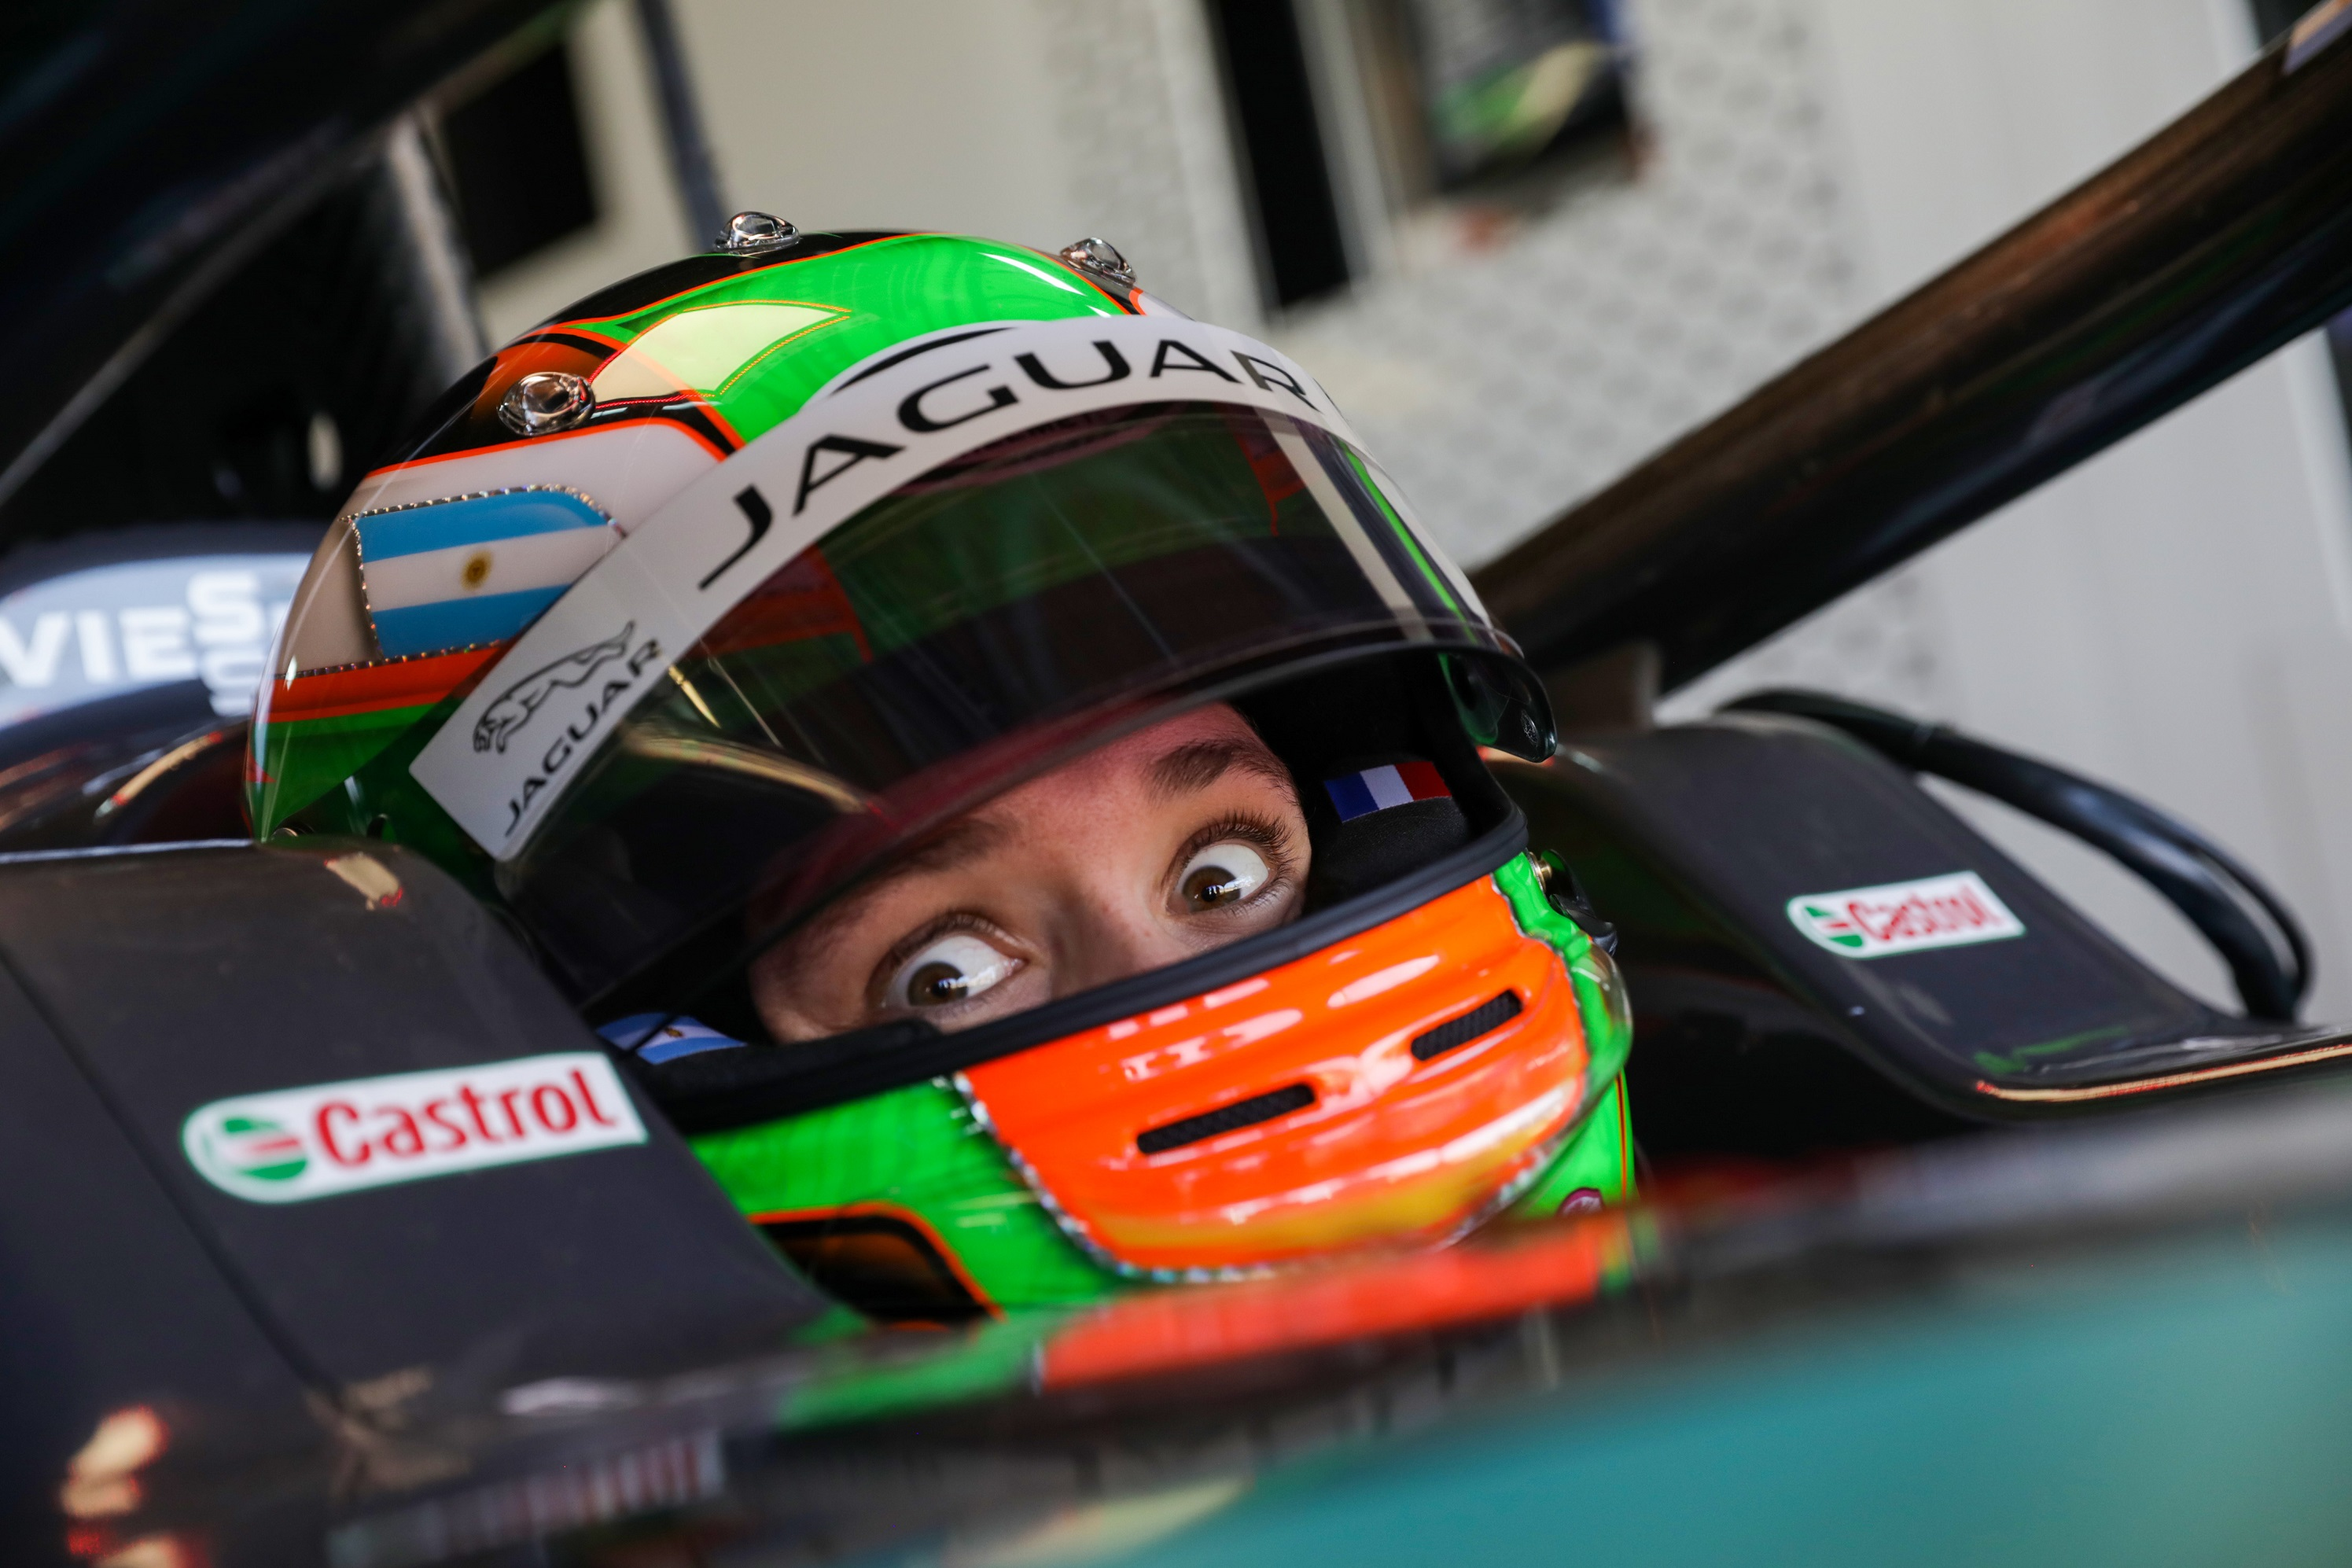 SACHA FENESTRAZ JOINS JAGUAR RACING AS RESERVE DRIVER